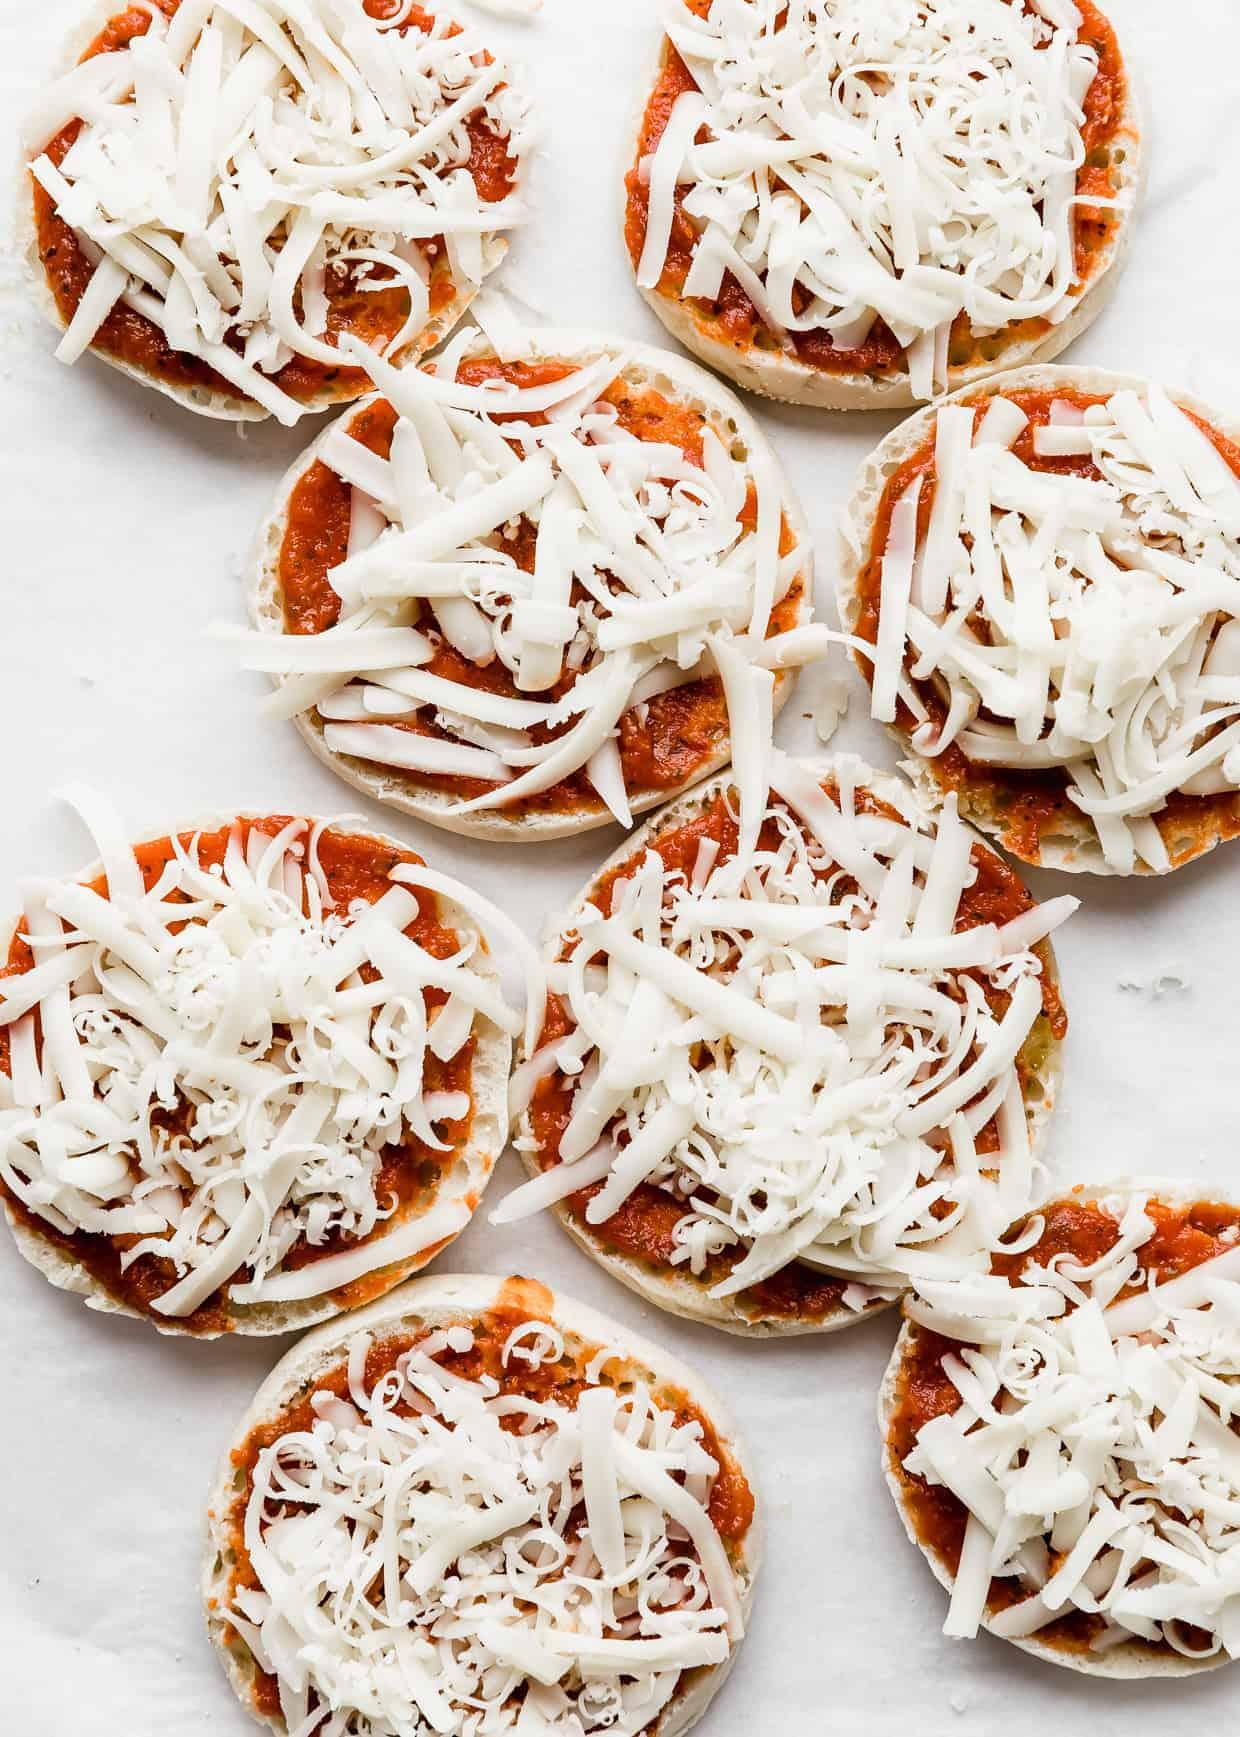 Shredded mozzarella overtop of eight English muffin halves.